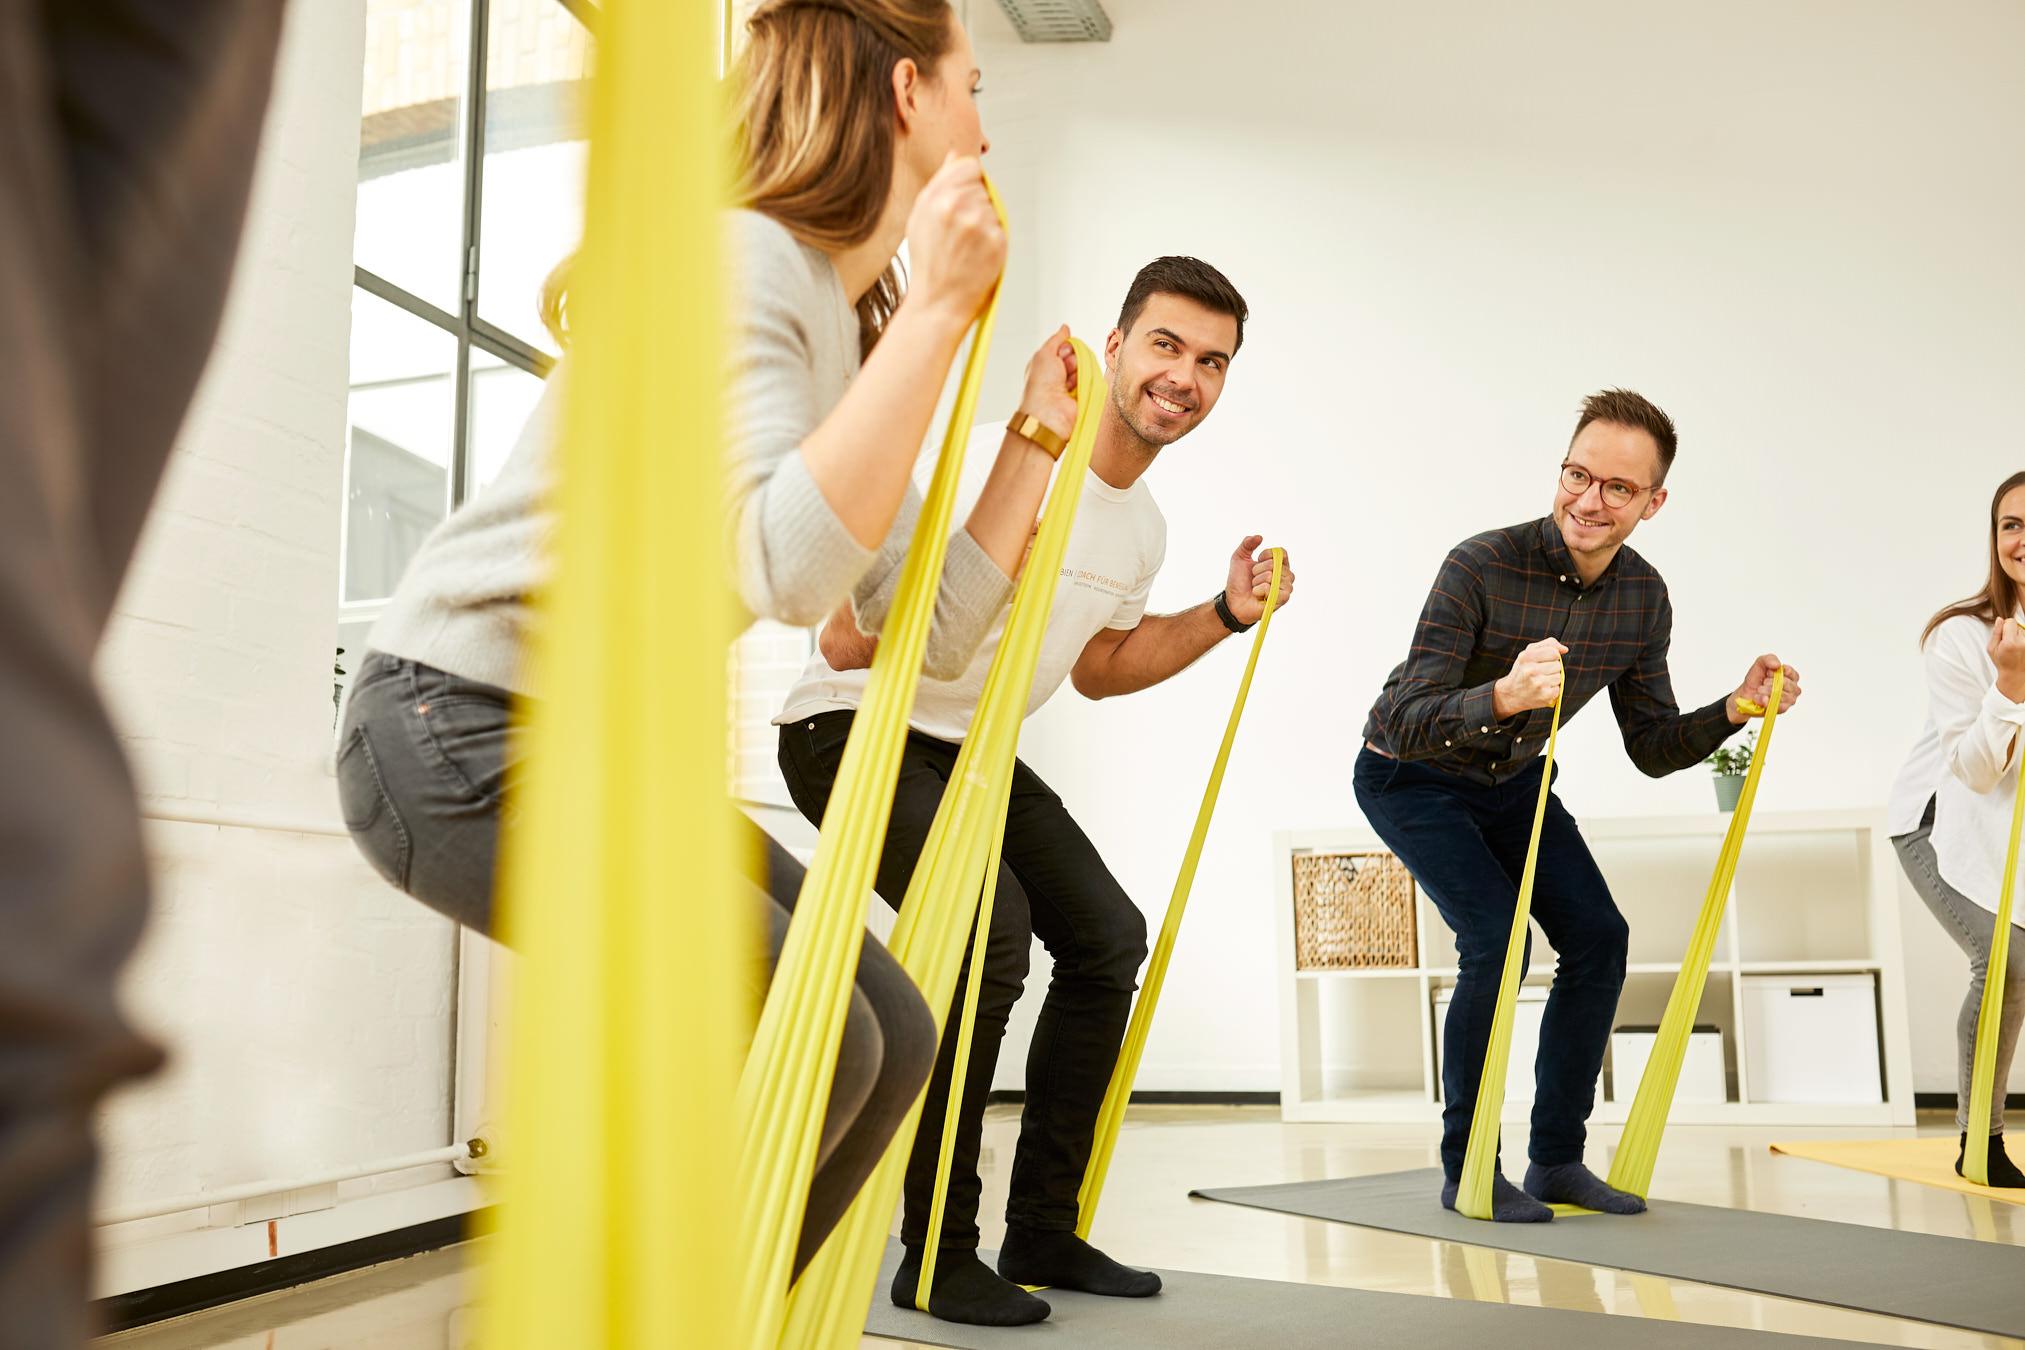 oliver robien fitness coach bewegung terraband gelb joern strojny